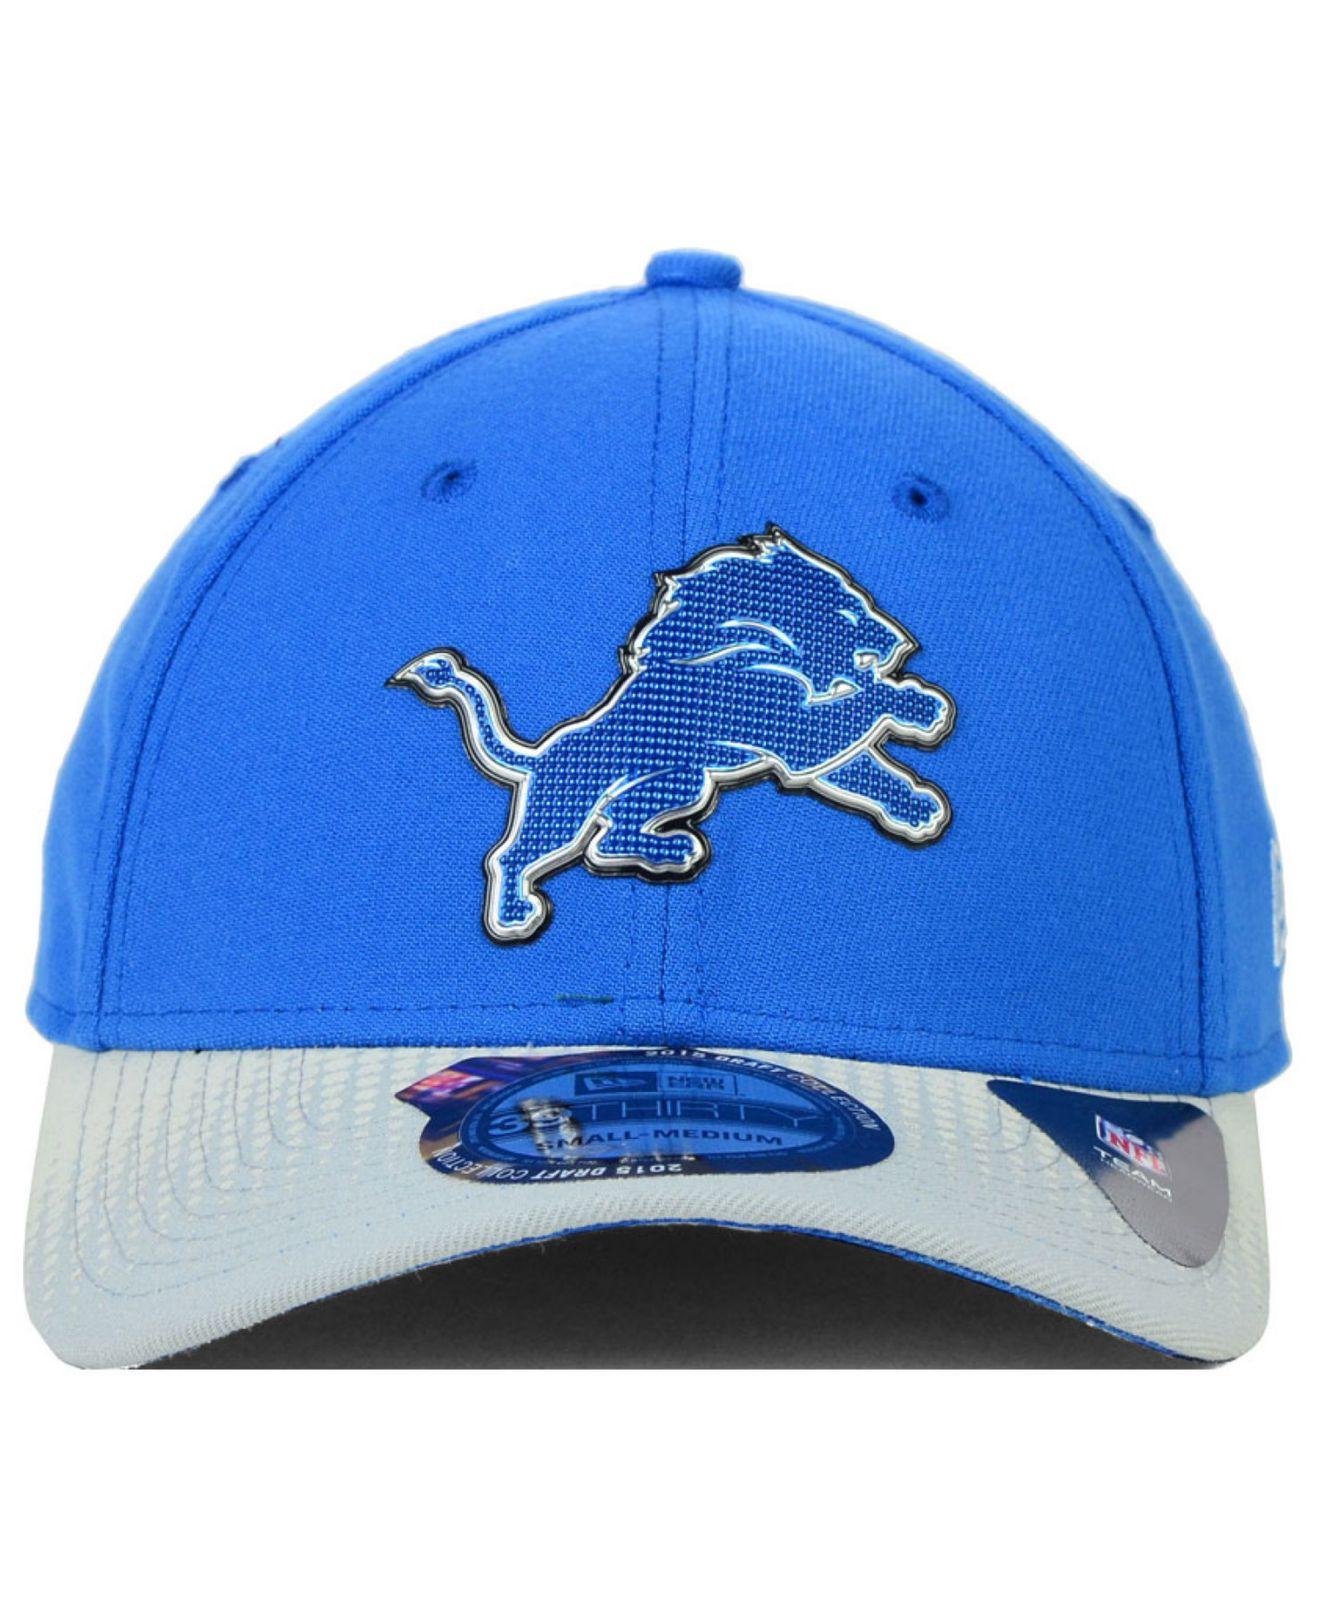 Lyst - Ktz Detroit Lions 2015 Nfl Draft 39Thirty Cap in Blue for Men cf229a20198